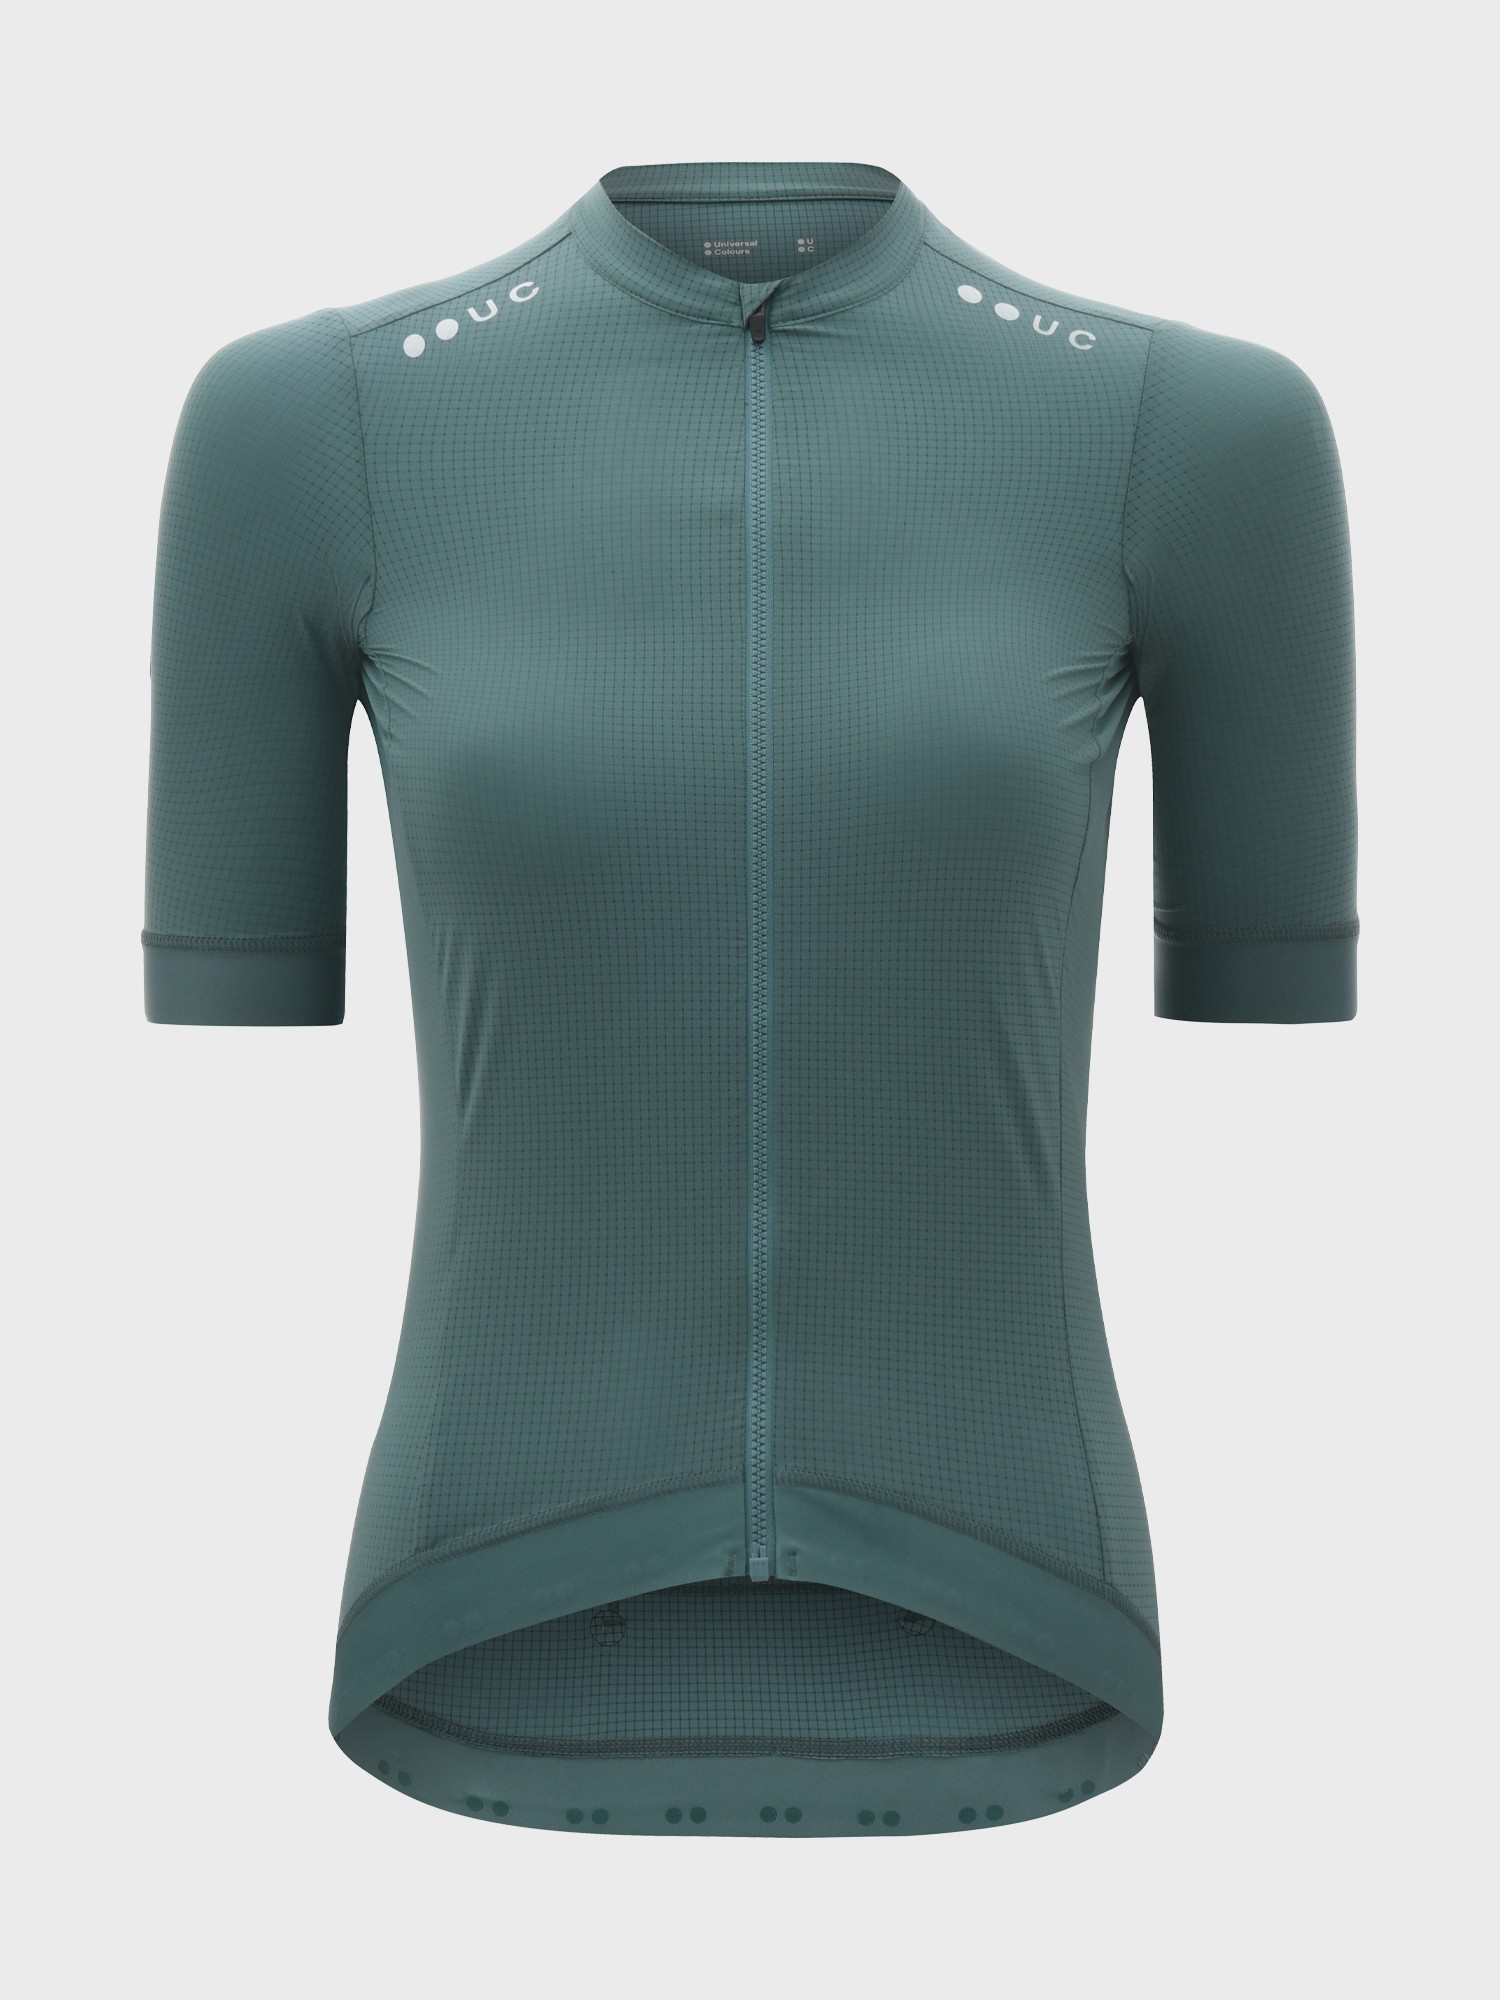 Chroma Women's Short Sleeve Jersey